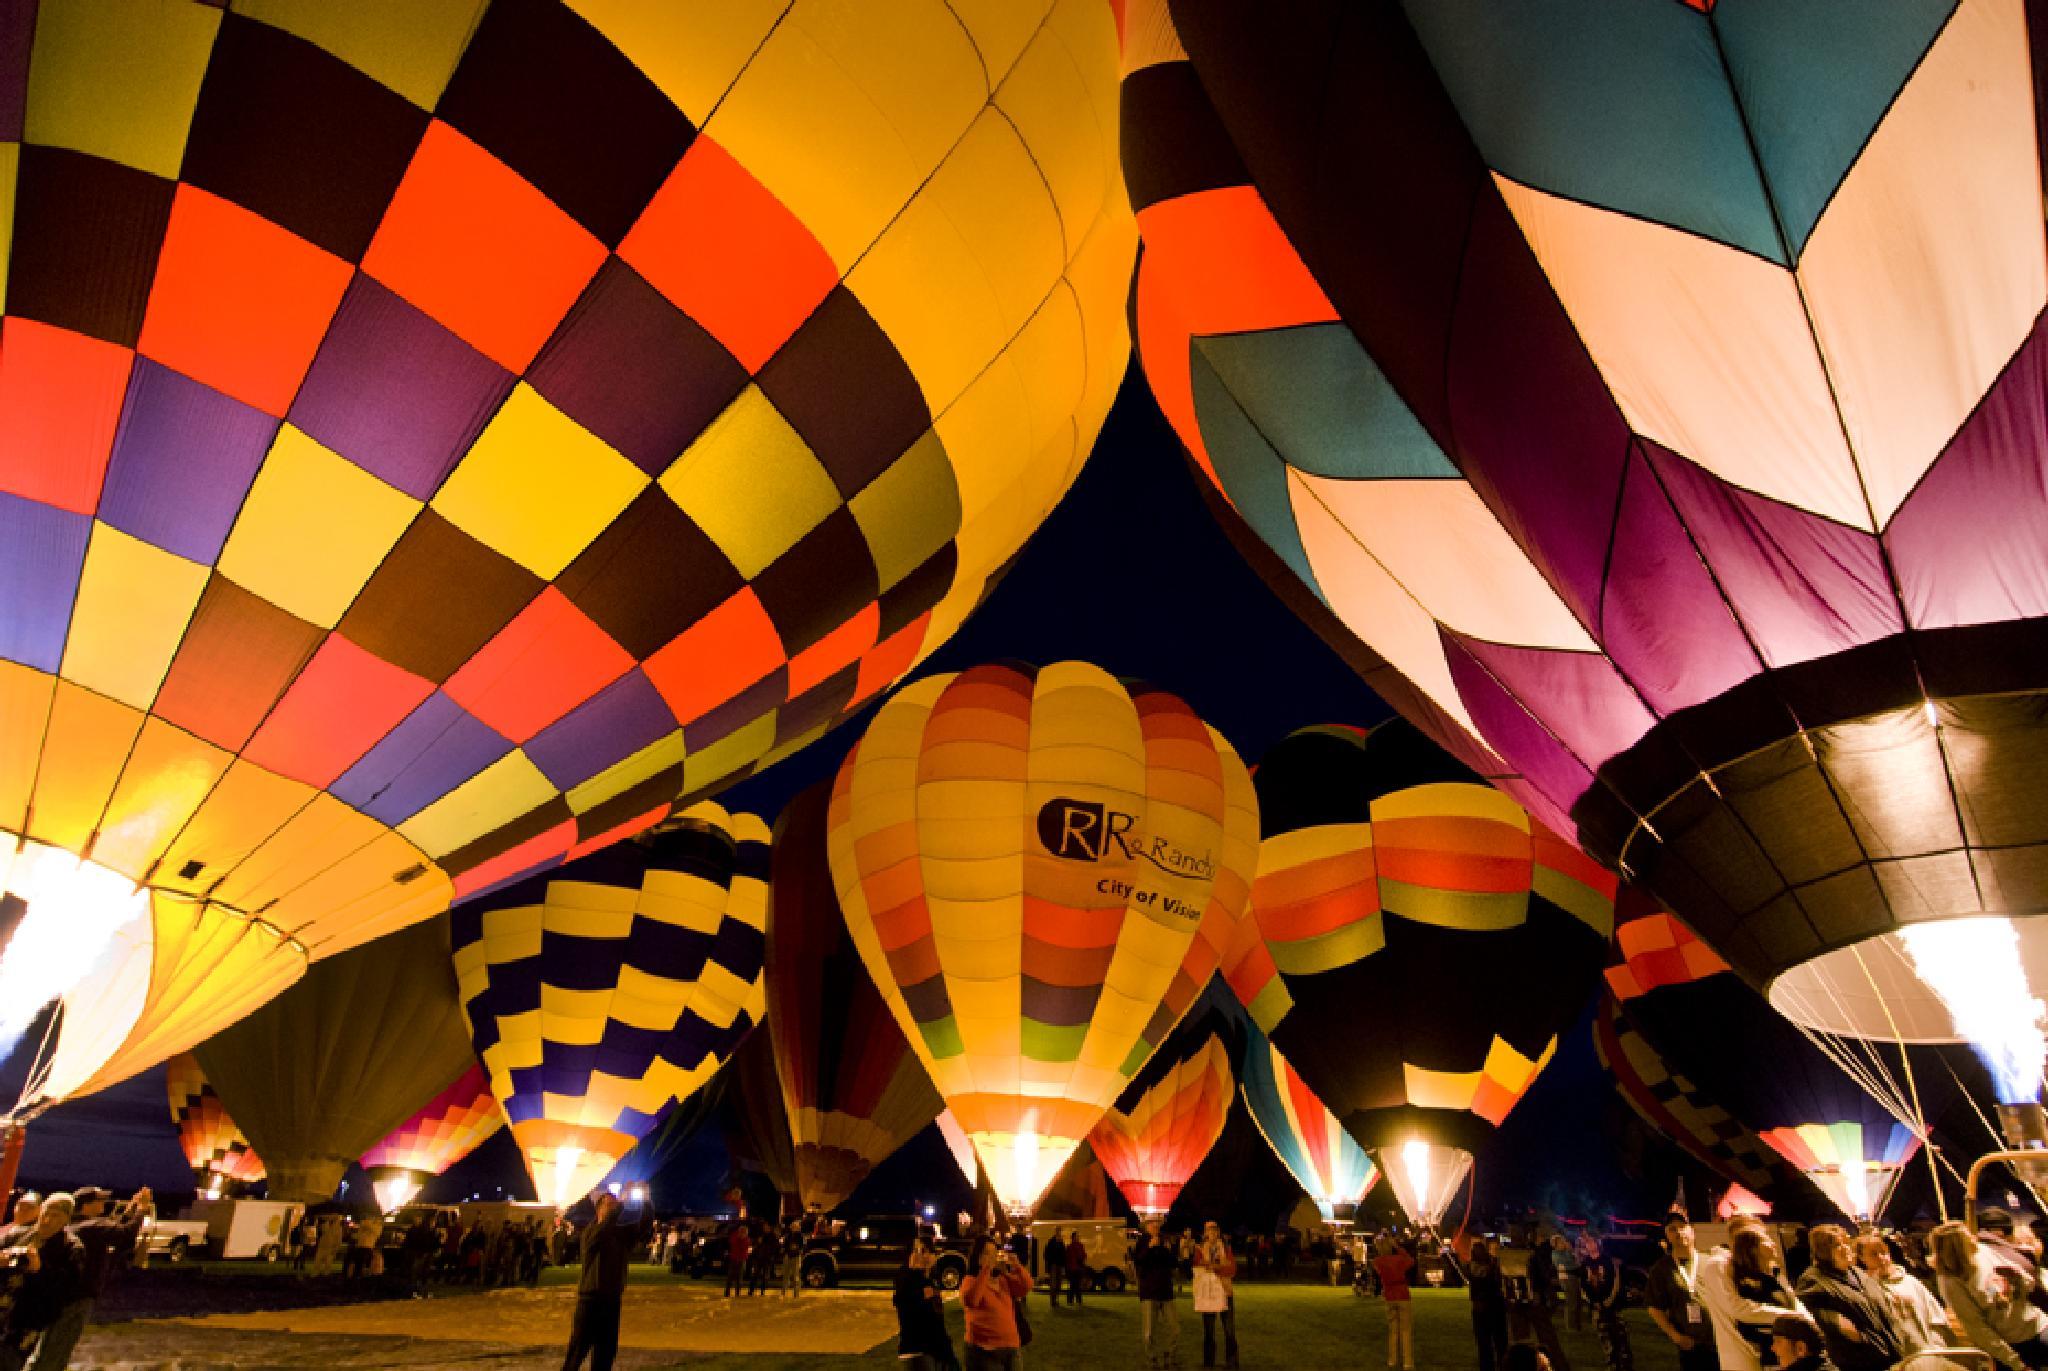 Albuquerque Balloon Fest by Pazzophoto